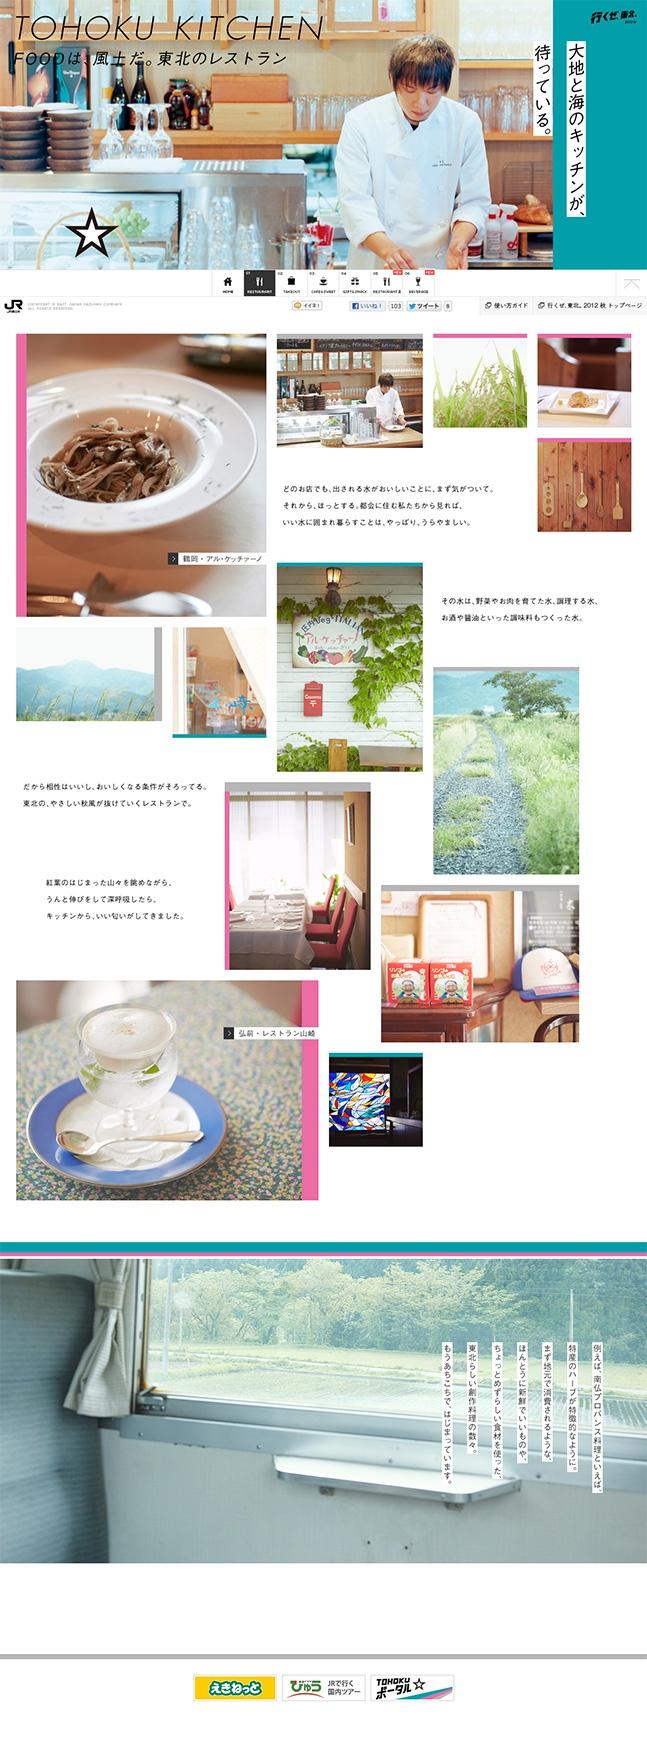 http://ikuze-tohoku.jp/kitchen/